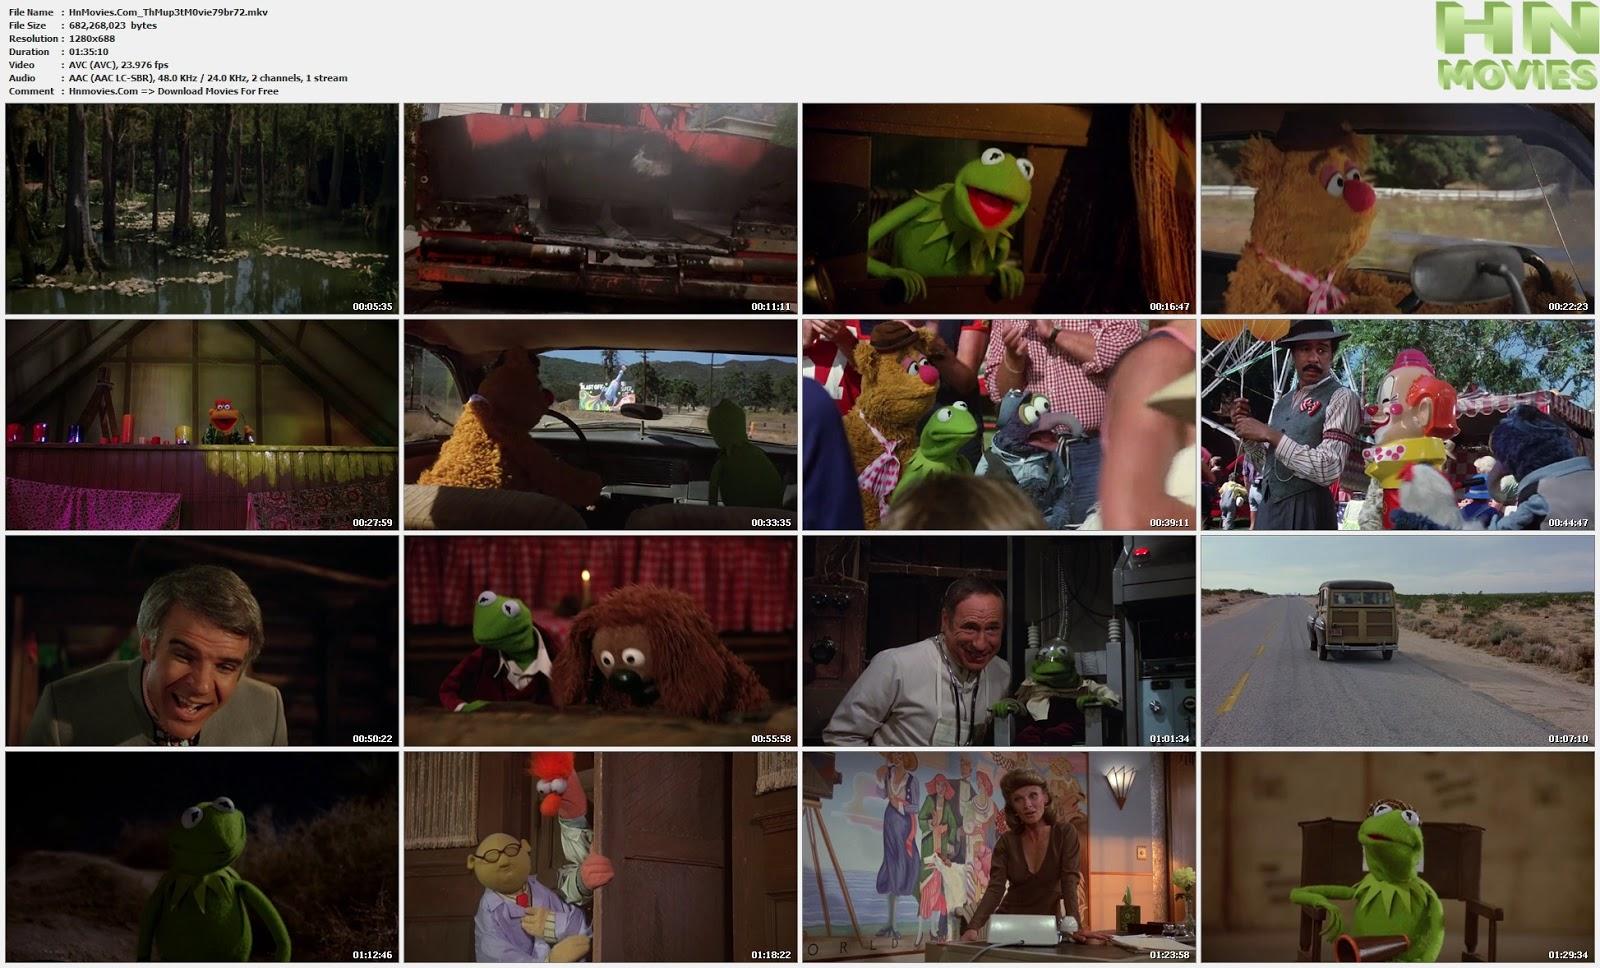 movie screenshot of The Muppet Movie fdmovie.com